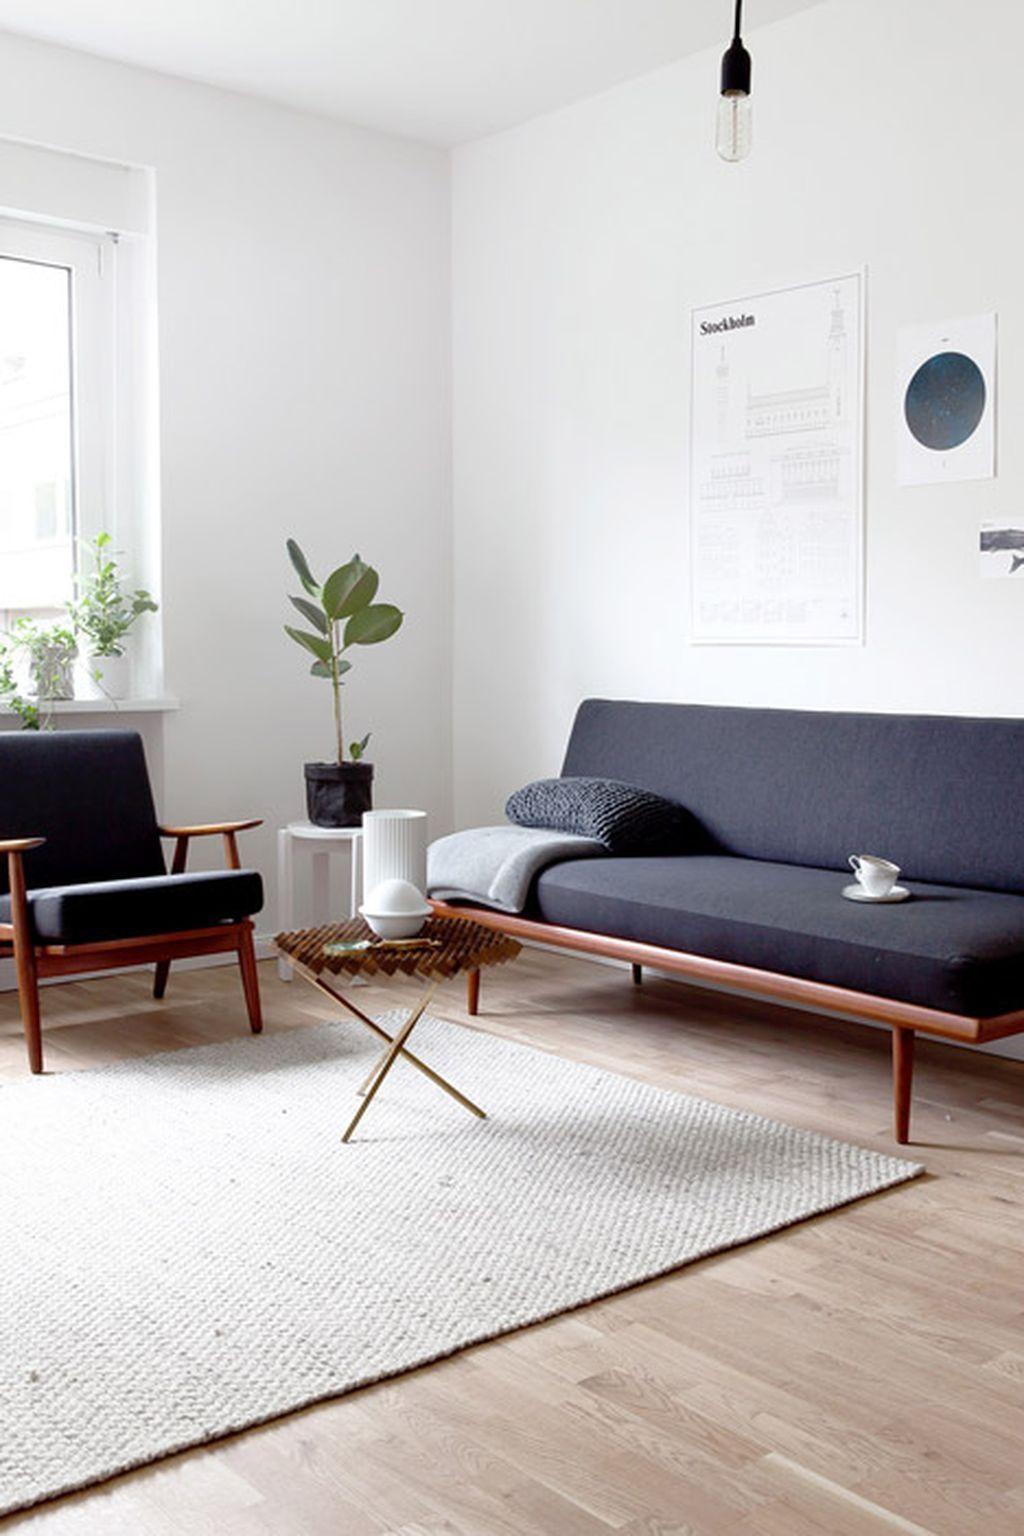 Livingroom #minimalist Cool 88 Minimalist Living Room Decor Ideas New Living Room Minimalist Design Decorating Inspiration